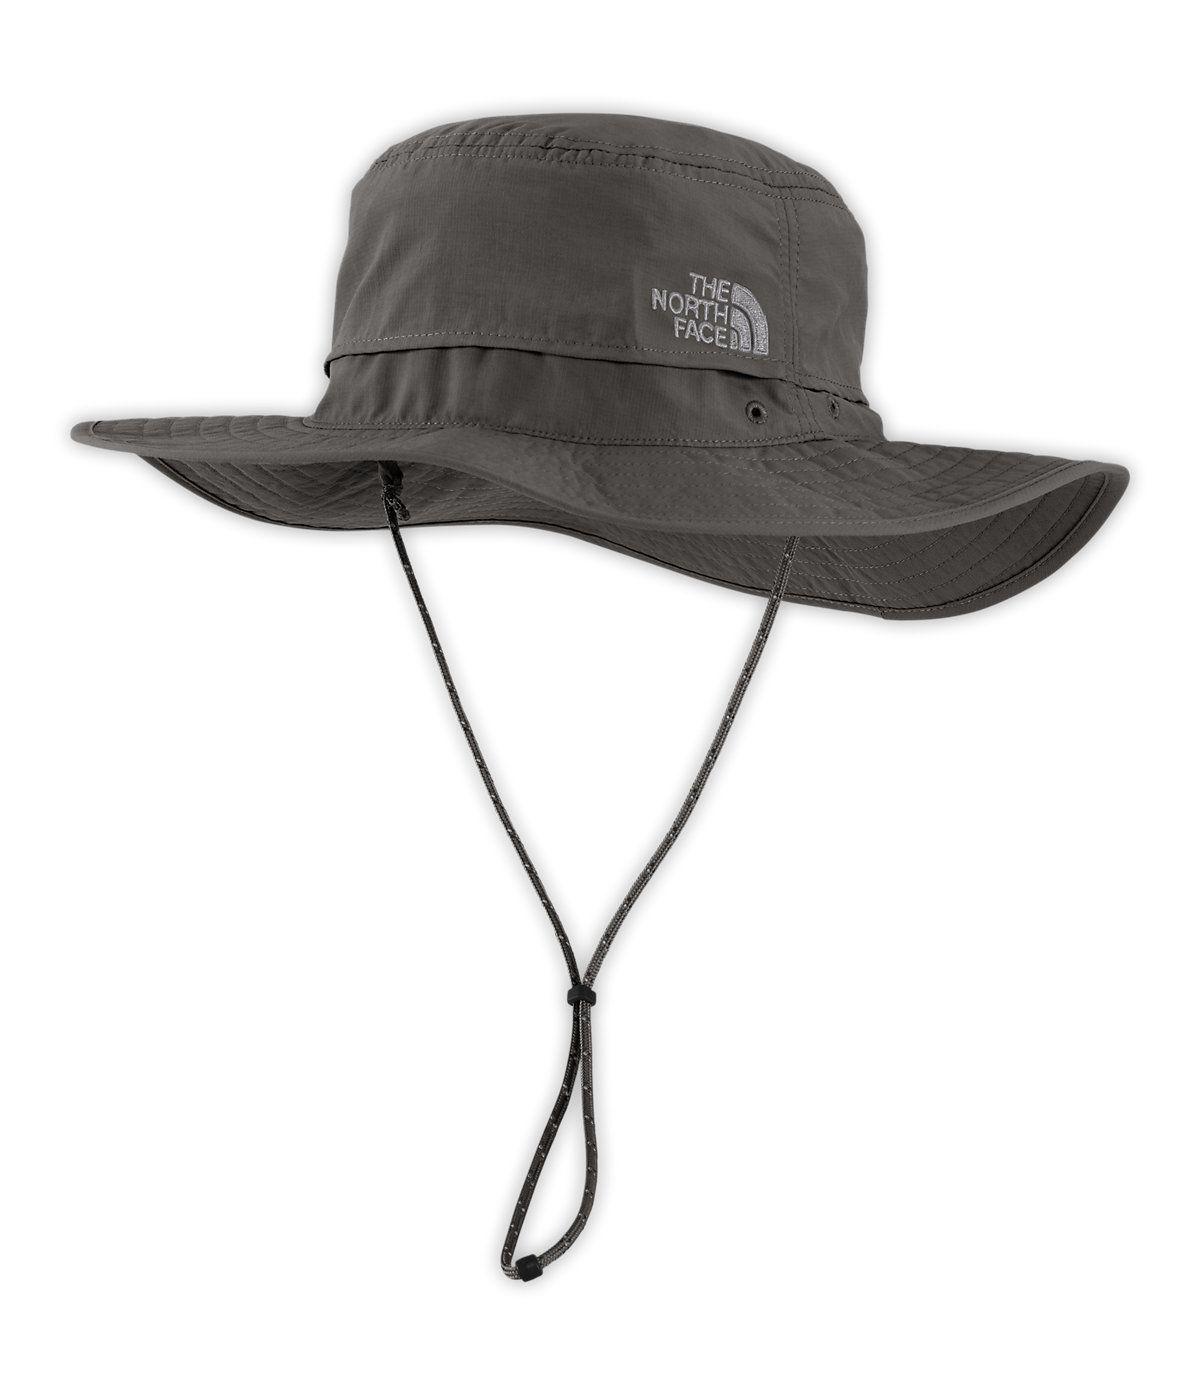 9fbb80ec03cdf Horizon breeze brimmer hat in 2019